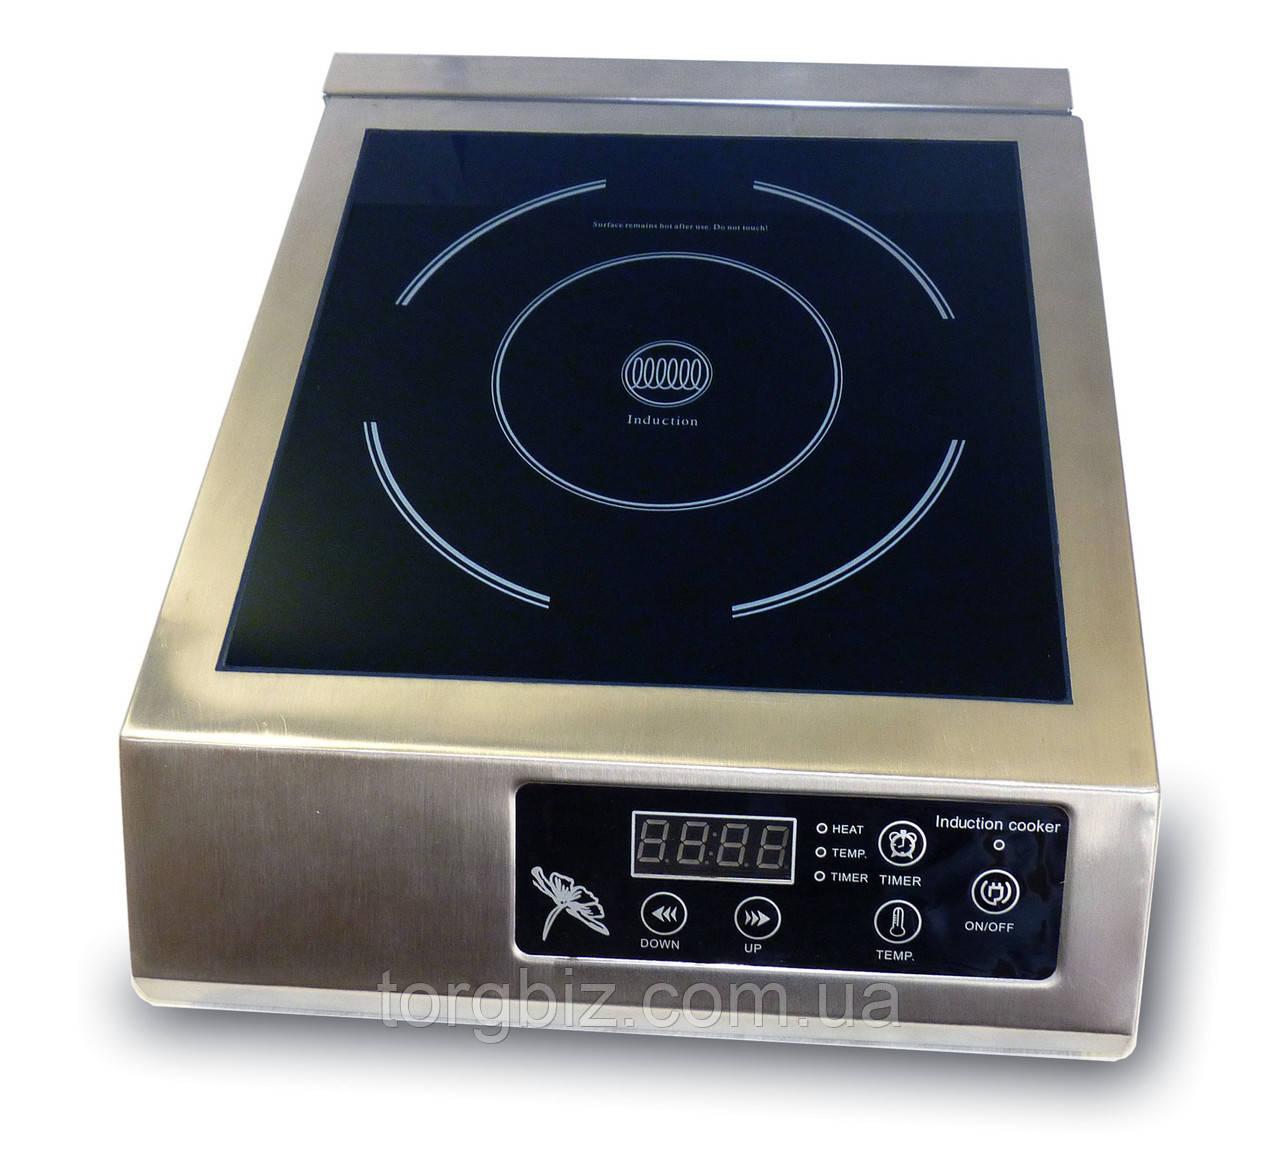 Плита индукционная GoodFood IC30 электрическая